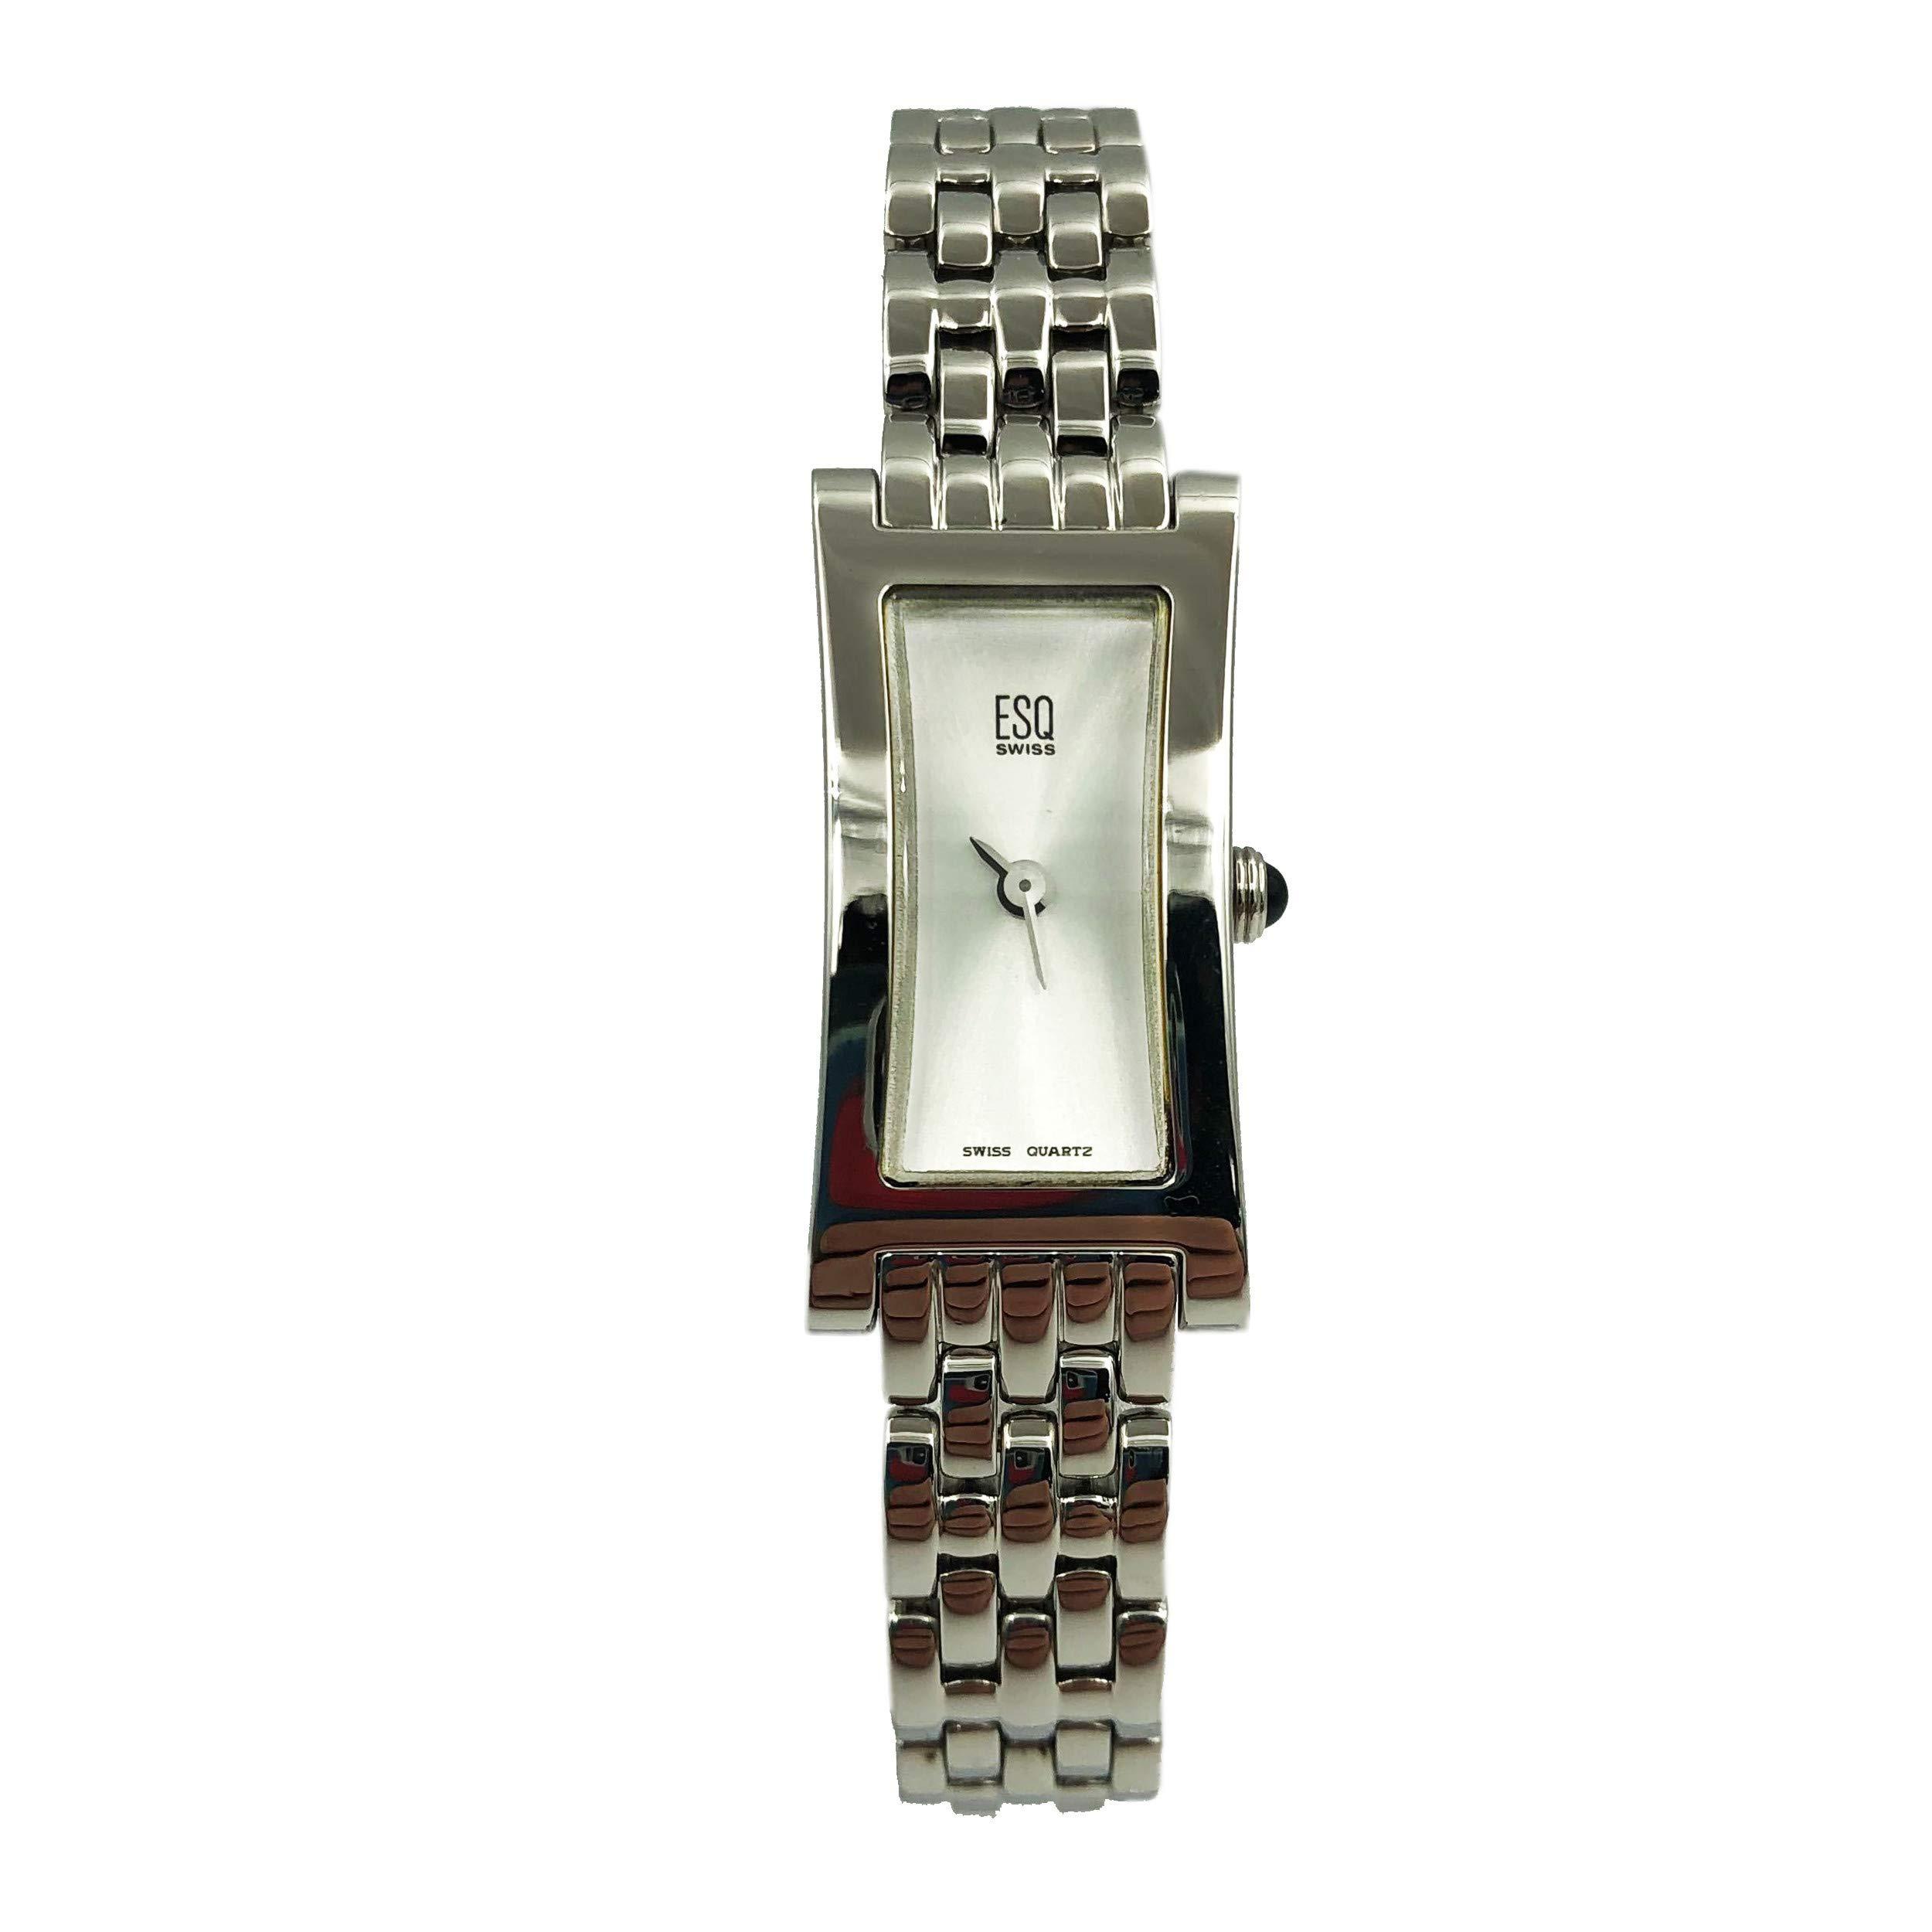 ESQ Tiado Quartz Male Watch 07100993 (Certified Pre-Owned) by ESQ (Image #1)